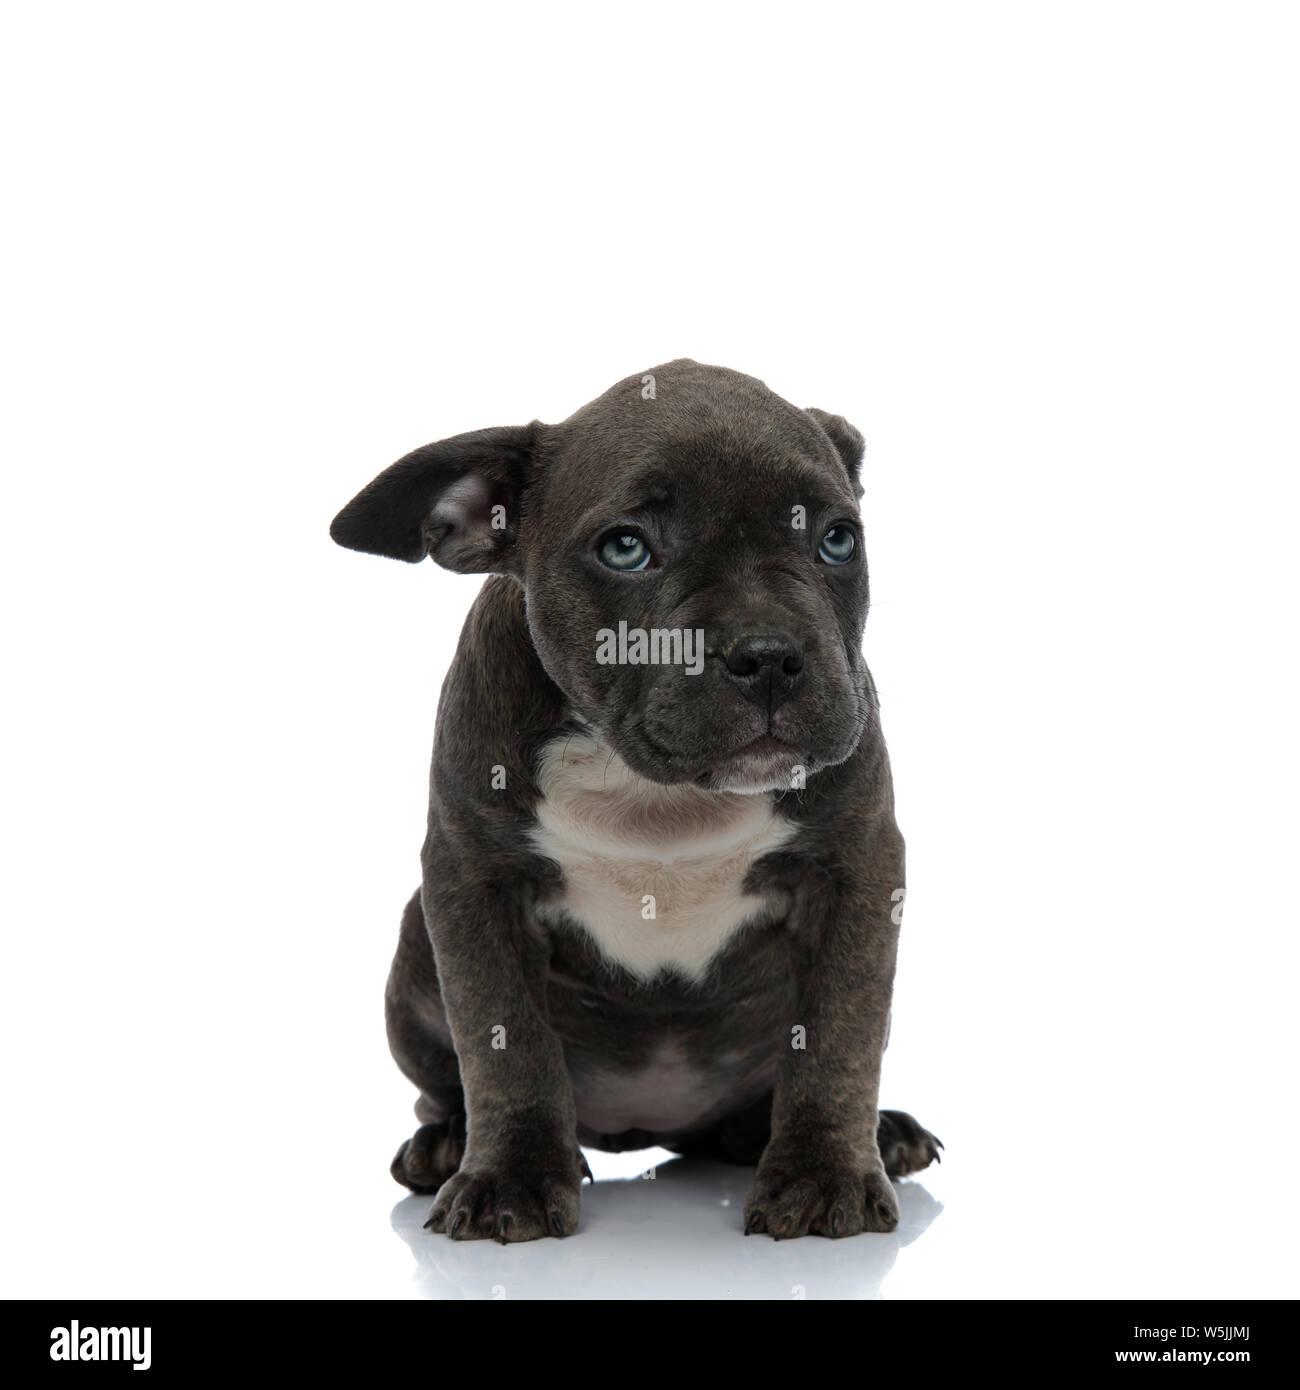 American Bully Dog Stock Photos & American Bully Dog Stock